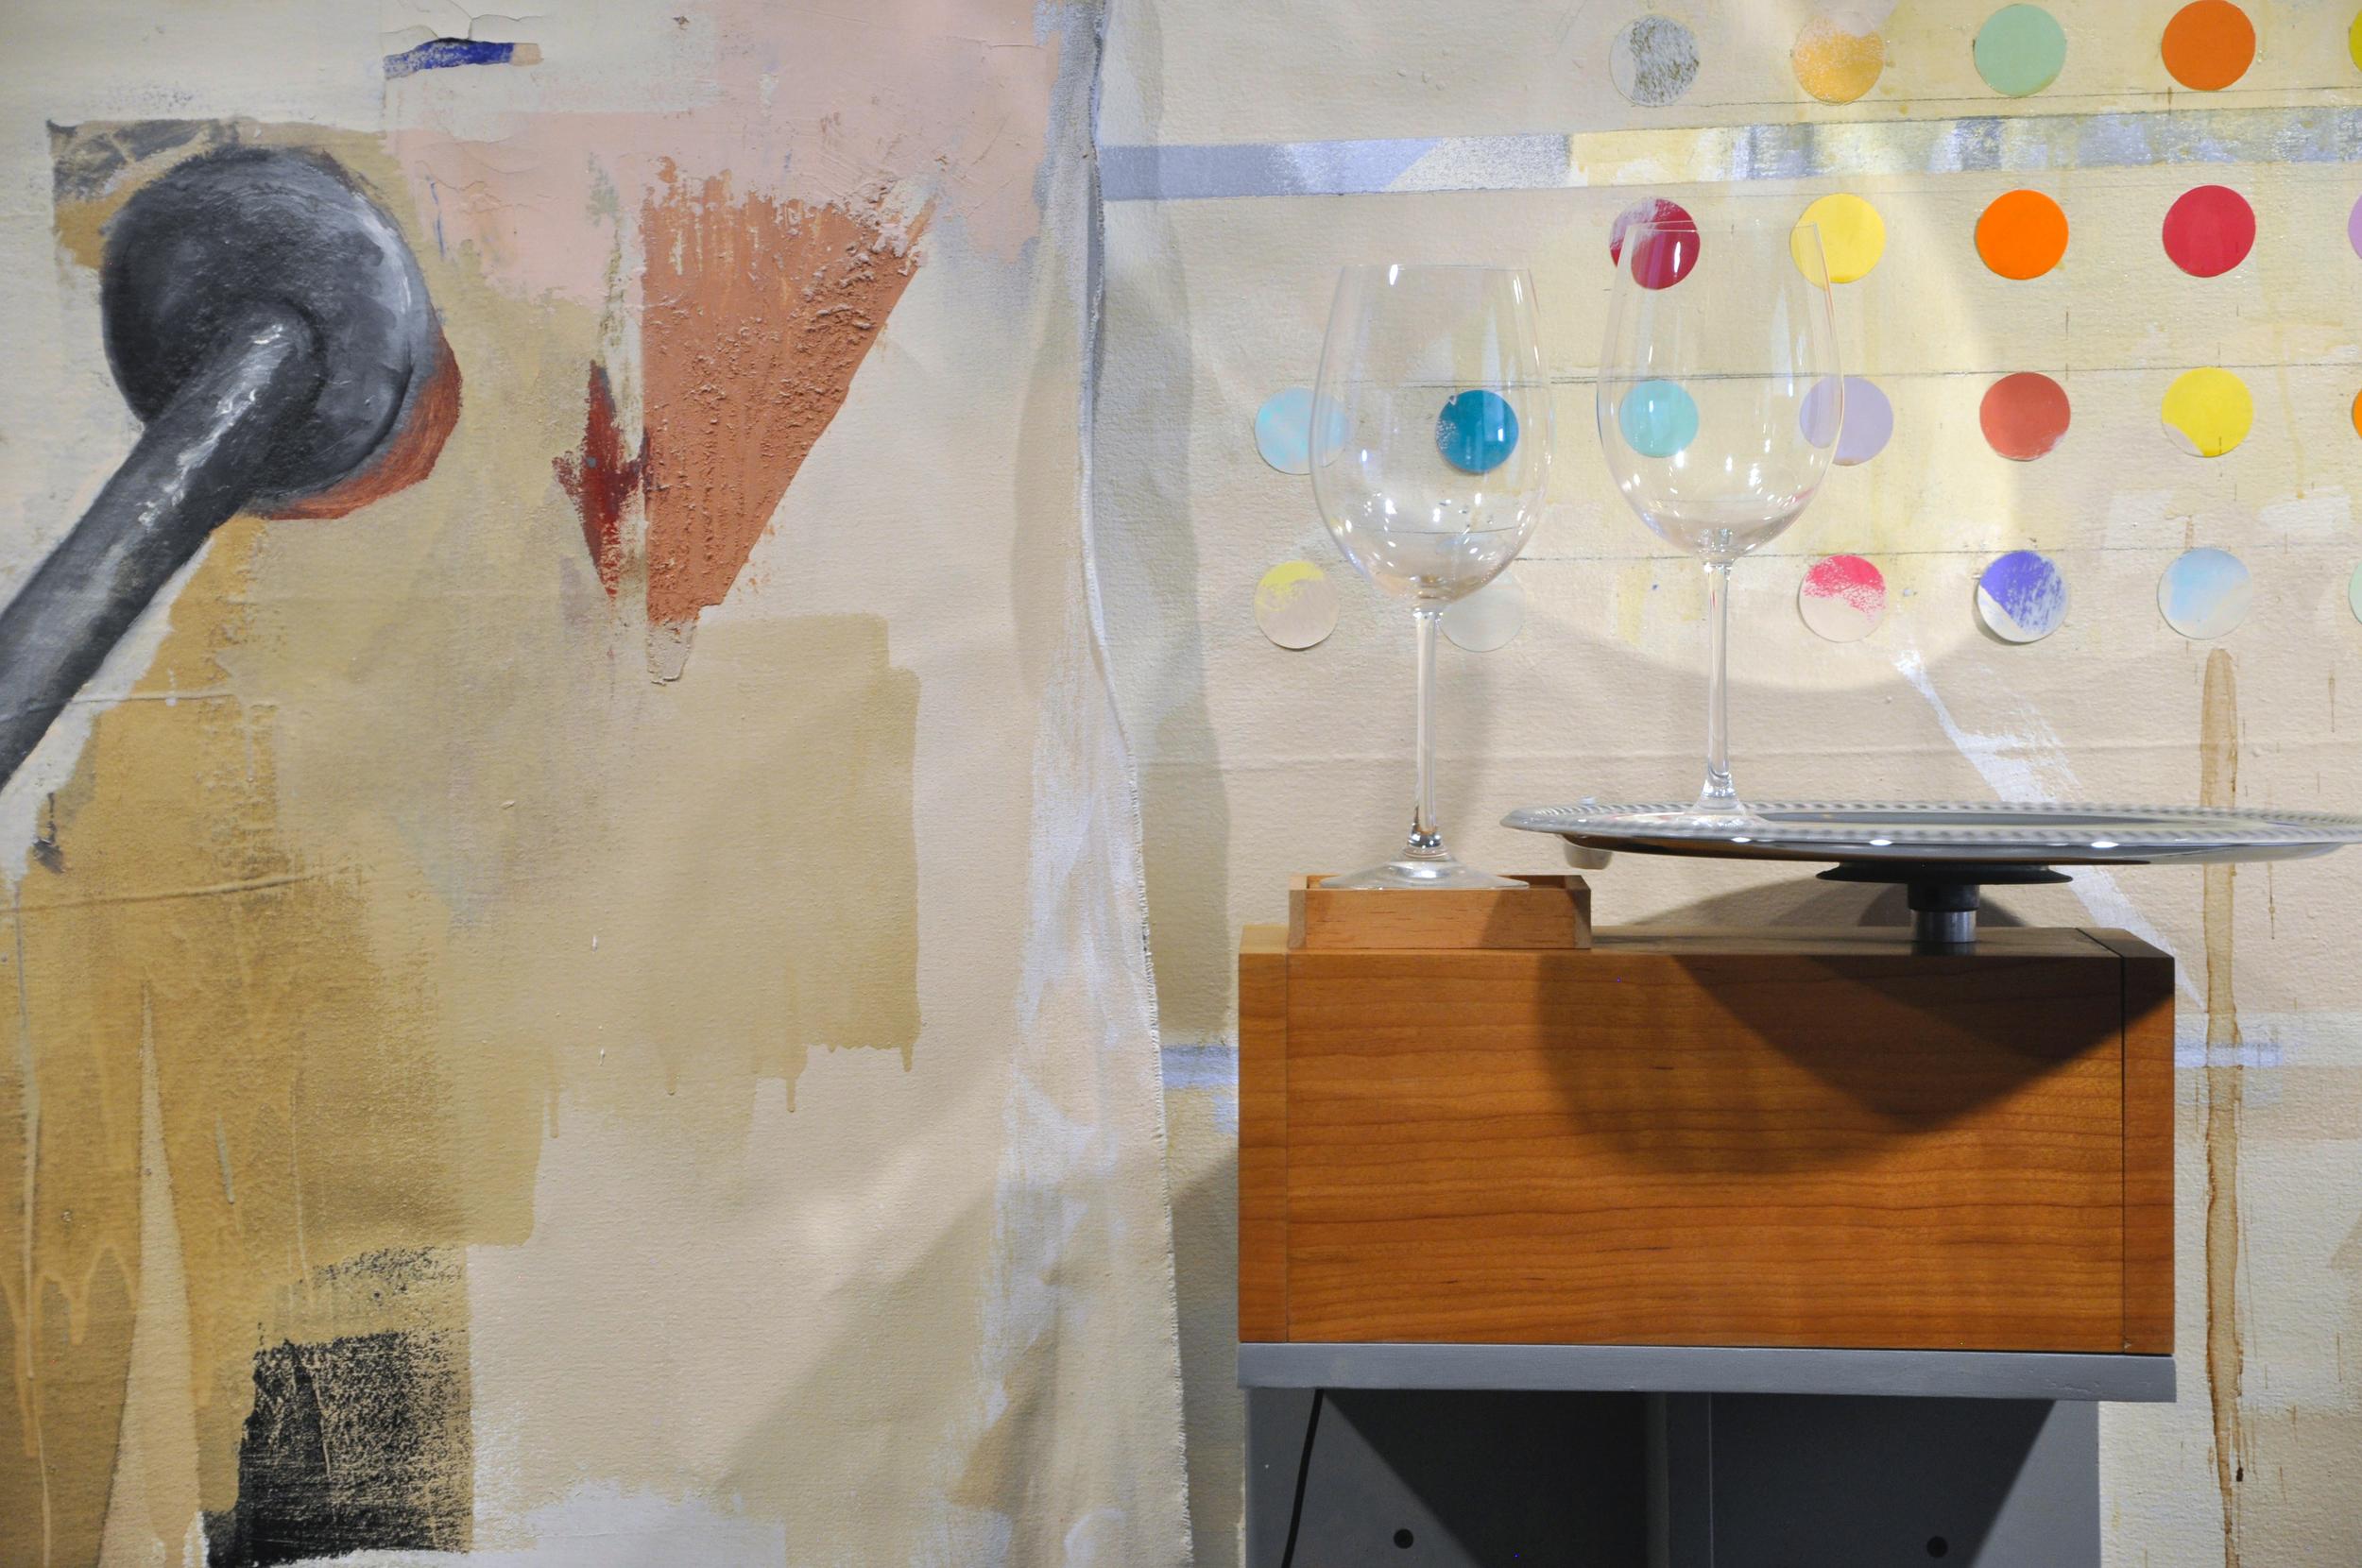 2016 , walnut veneer, MDF, DC motor, chrome platter, wine glasses, oil on canvas, sheetrock, joint compound